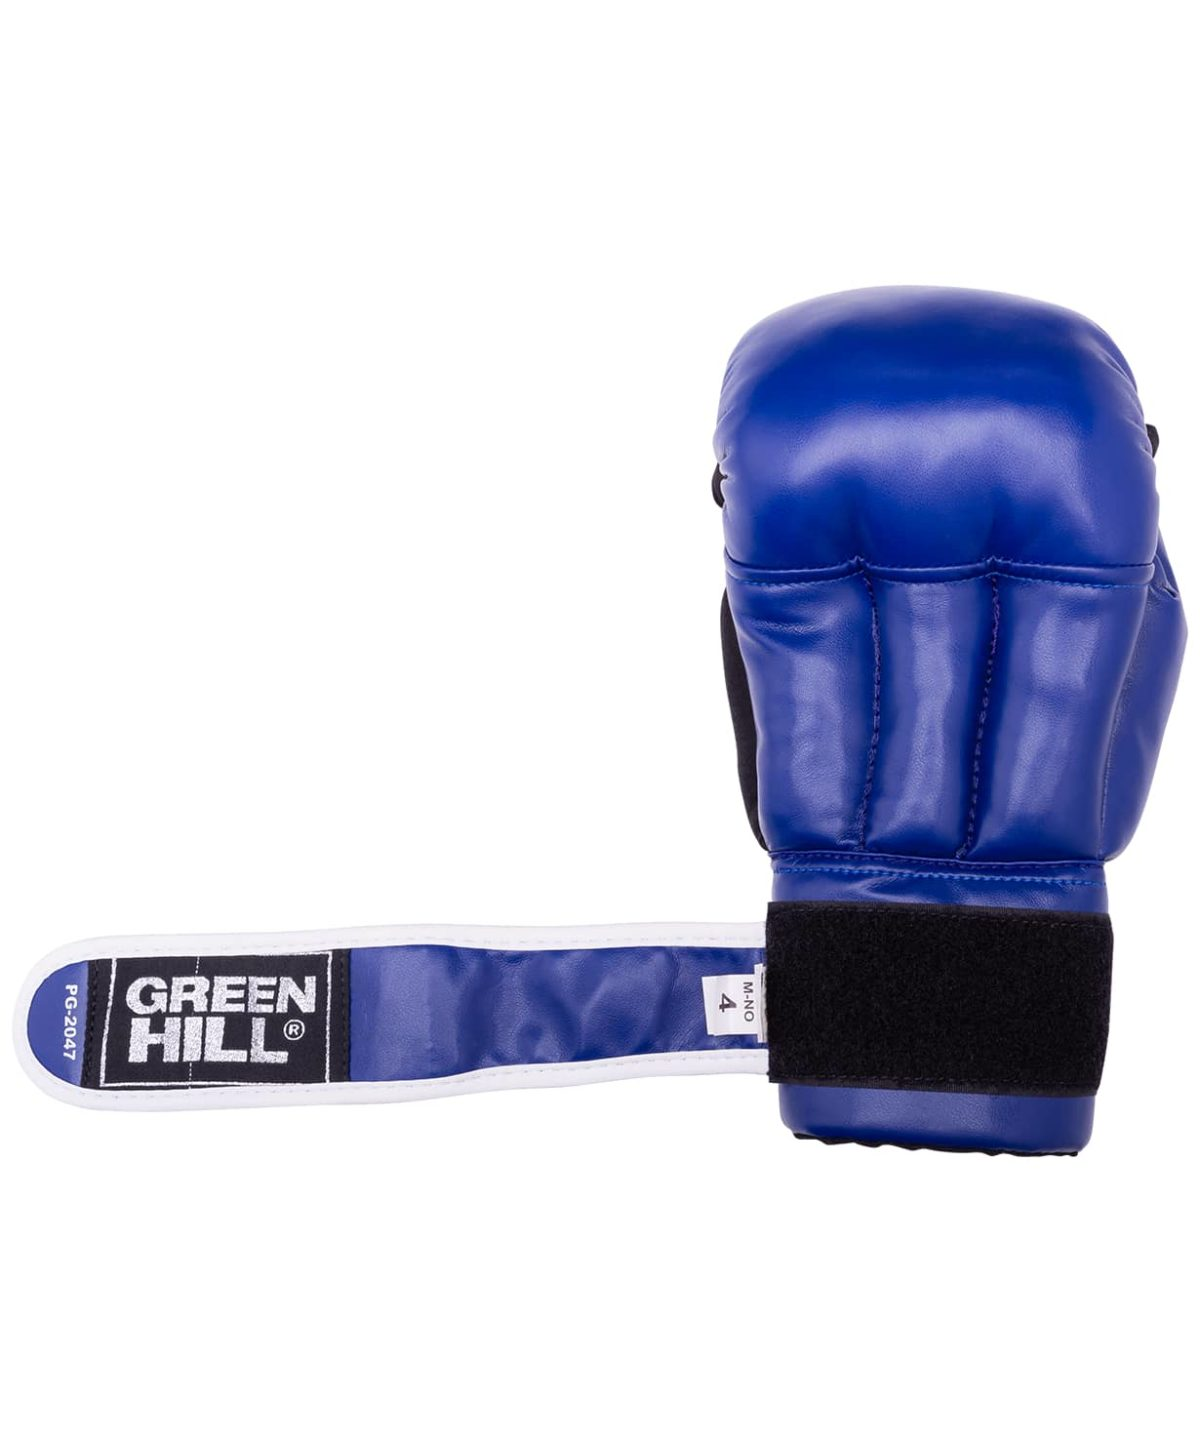 GREEN HILL Перчатки для рукопашного боя, к/з  PG-2047 - 4